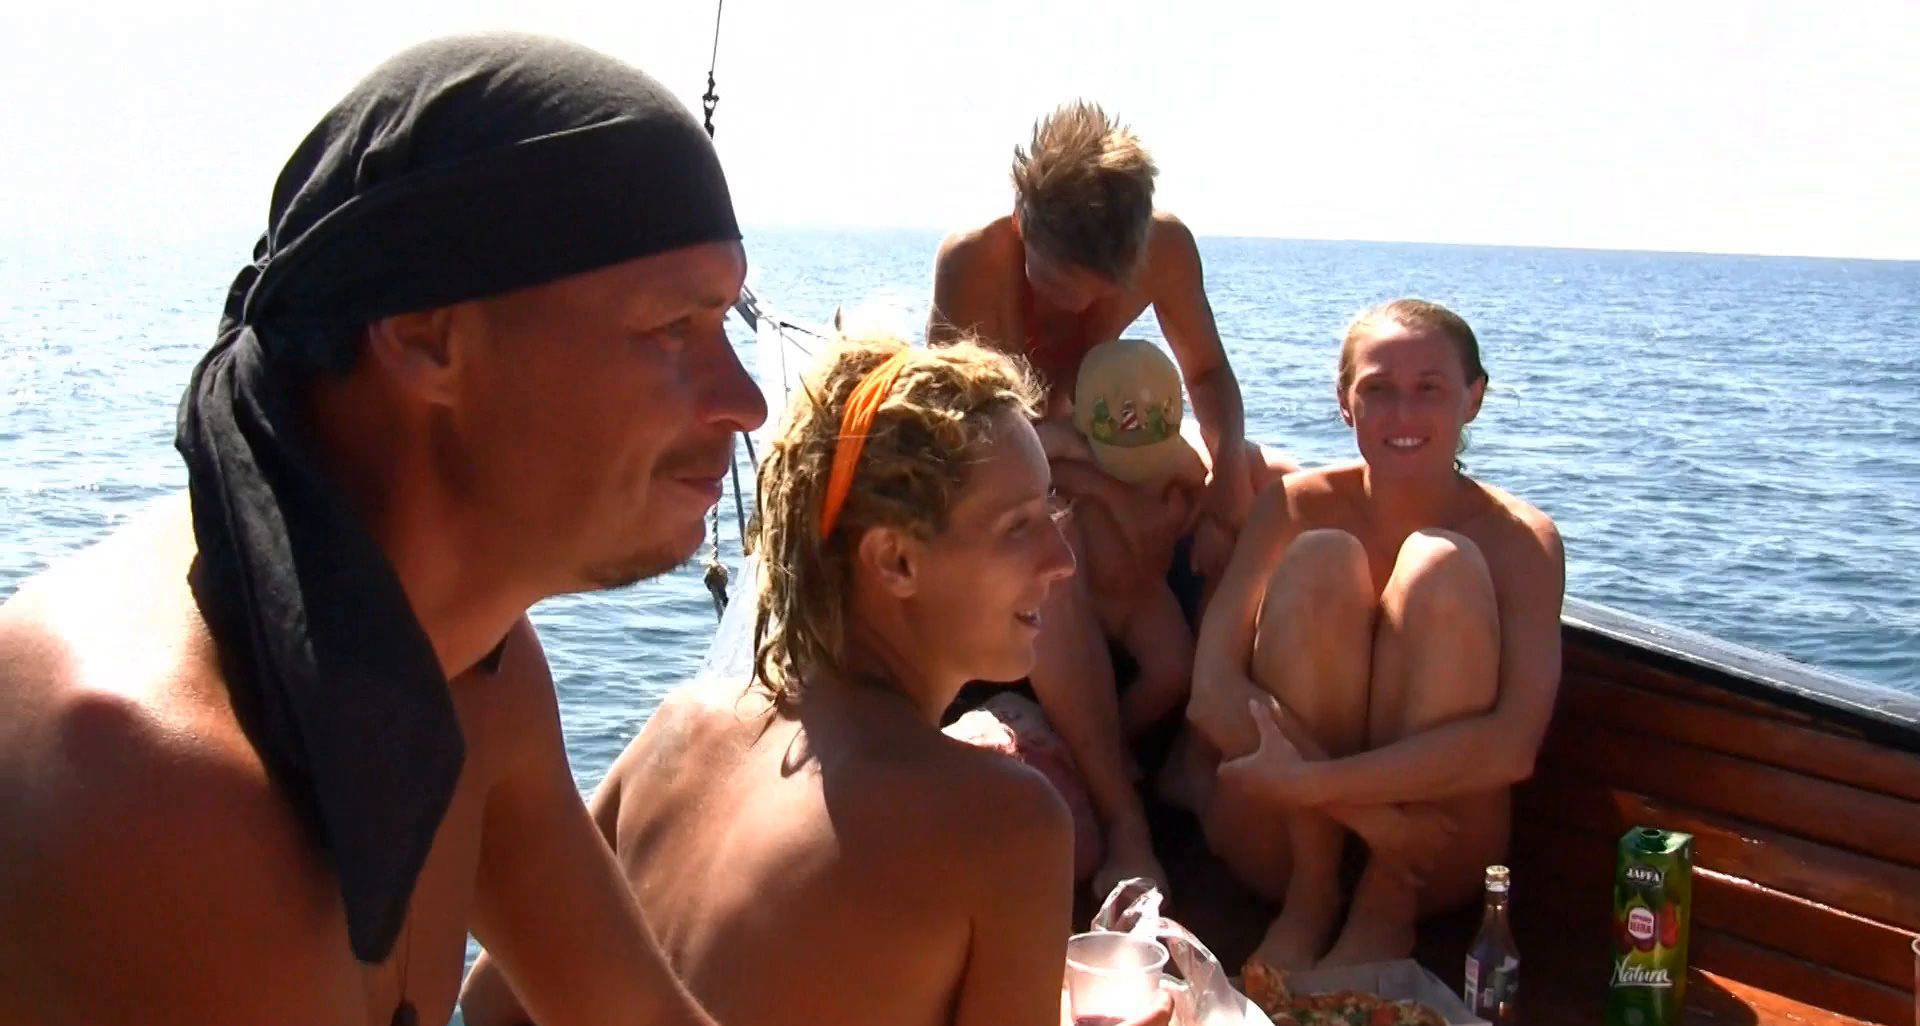 FKK Videos Ukrainian Sea Boating - 2